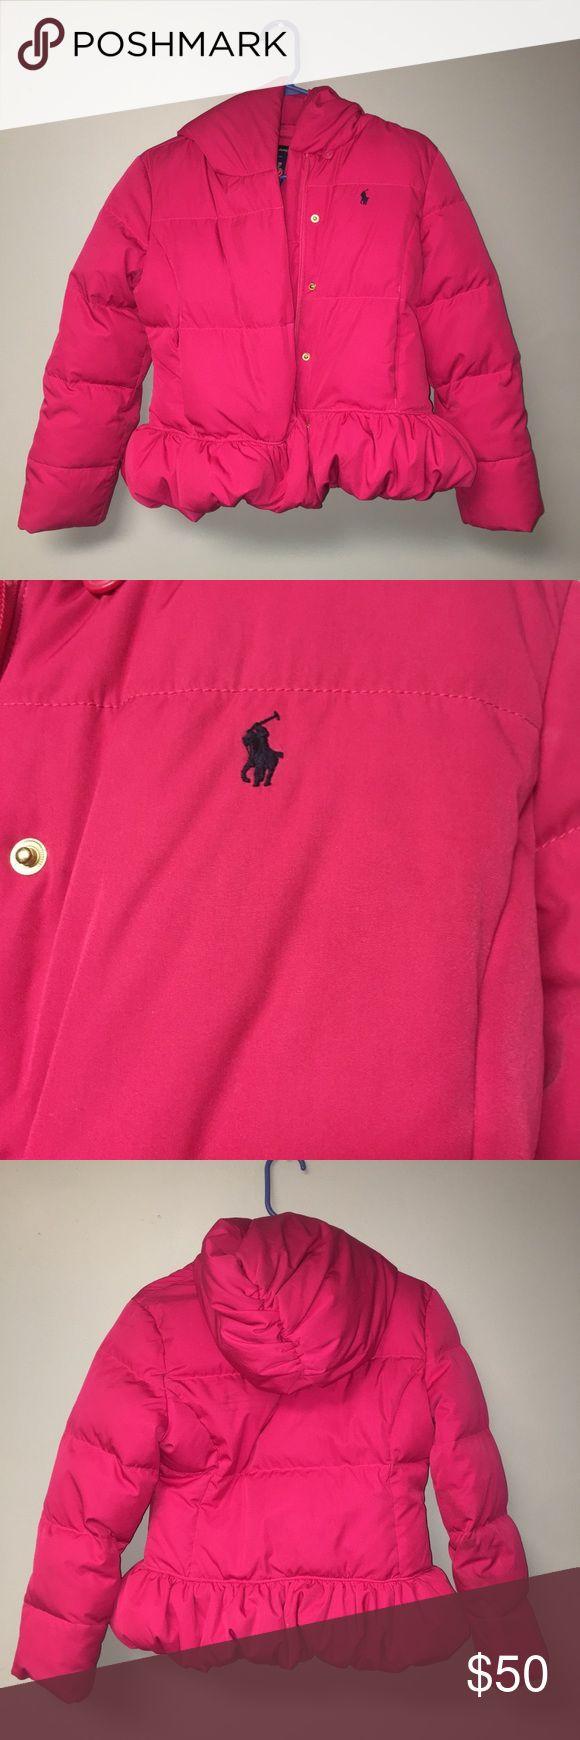 Ralph Lauren Polo Jacket Fuchsia Ralph Lauren Polo Jacket For Girls Ralph Lauren Jackets & Coats Puffers